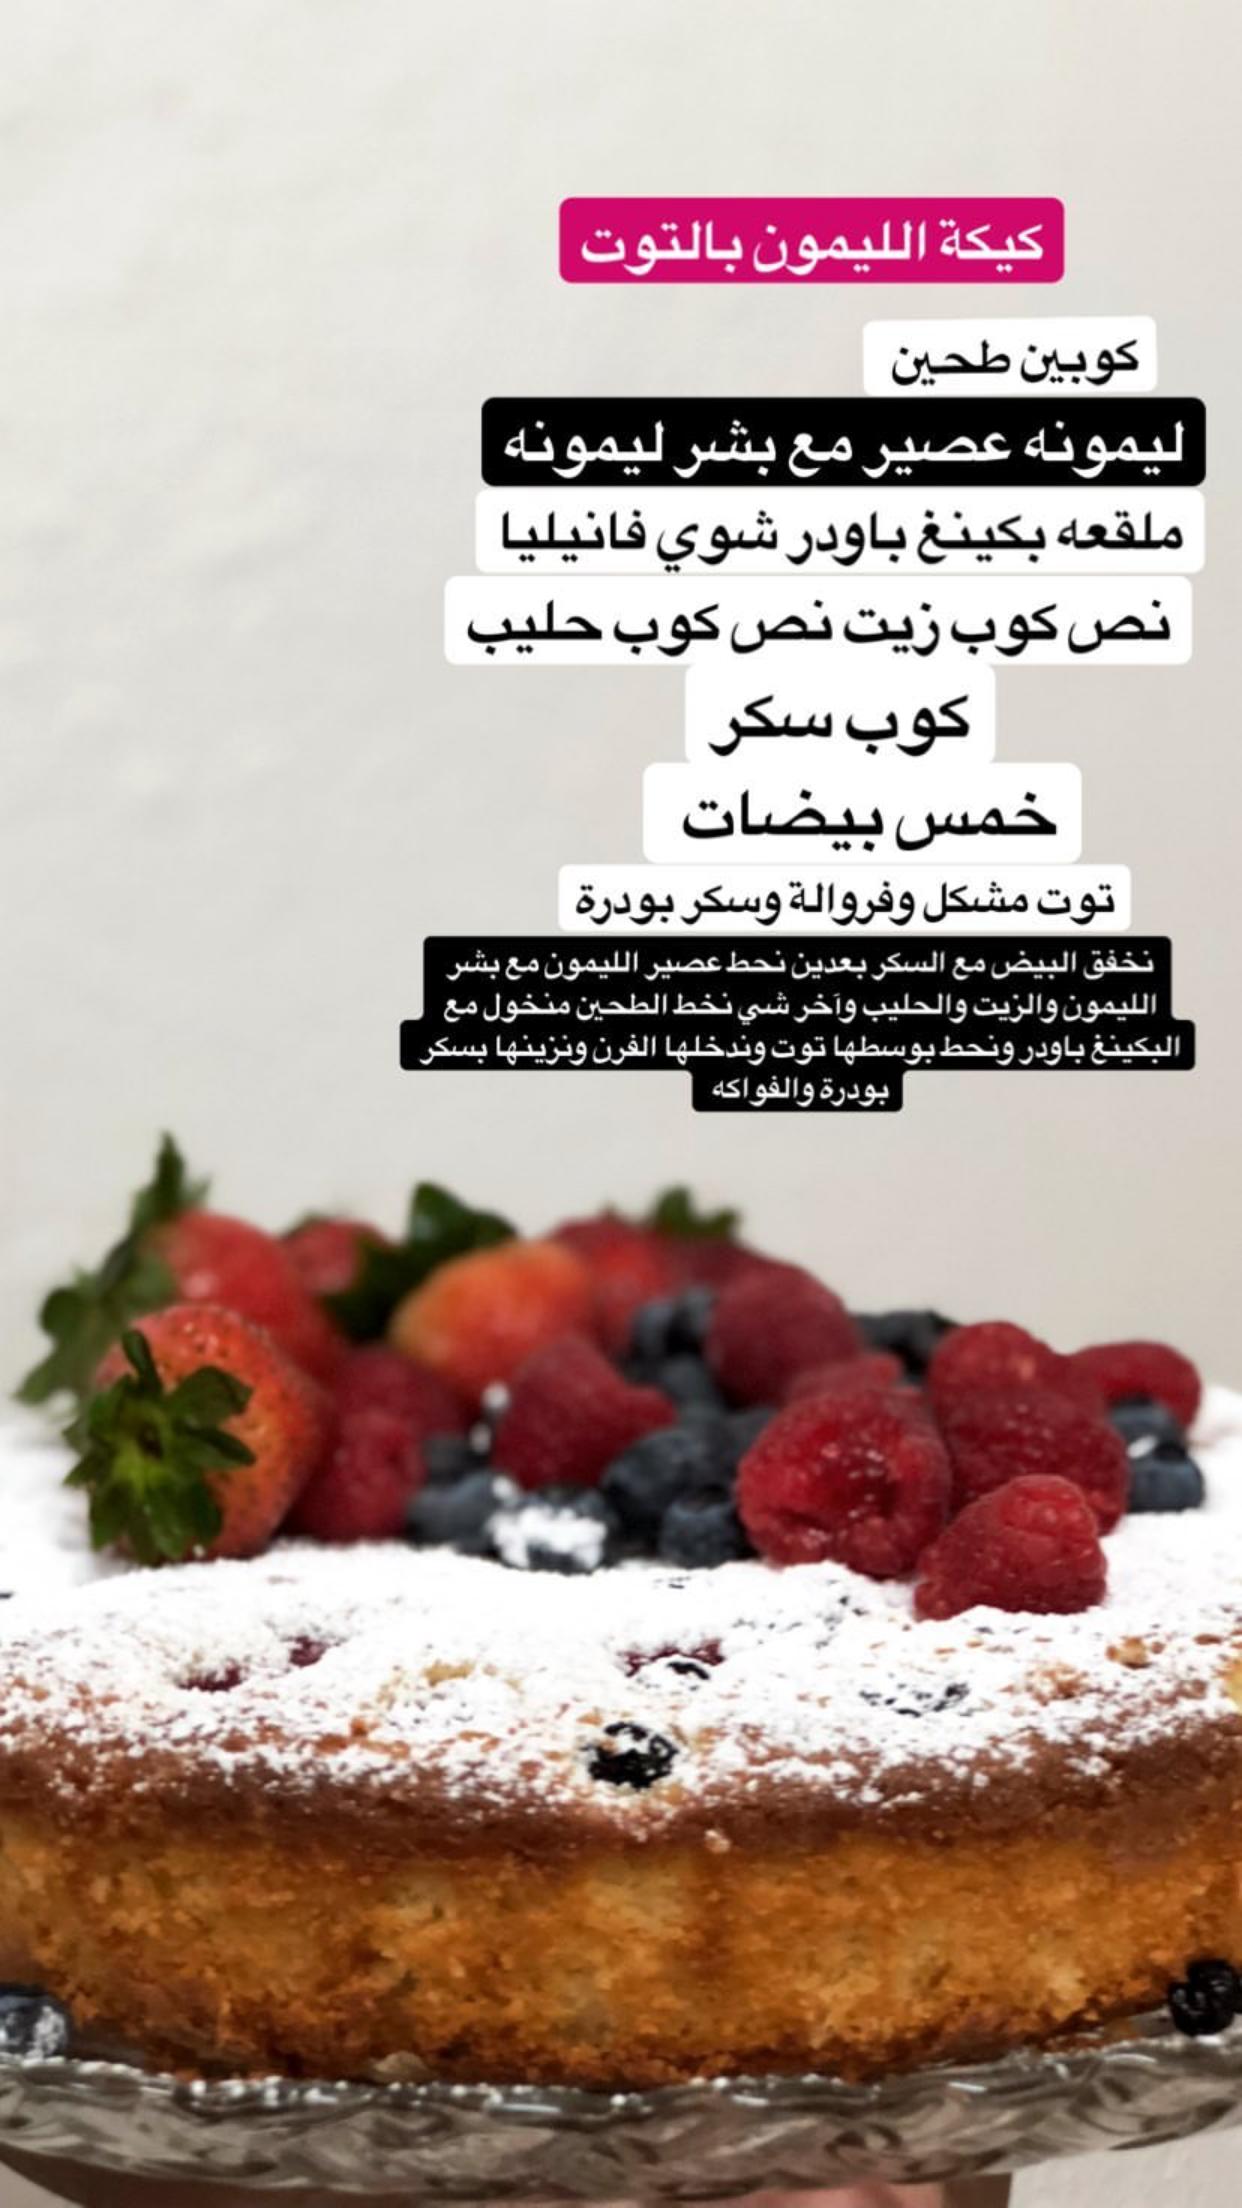 Pin By Asmaa On طبخ Recipes Food Arabic Food